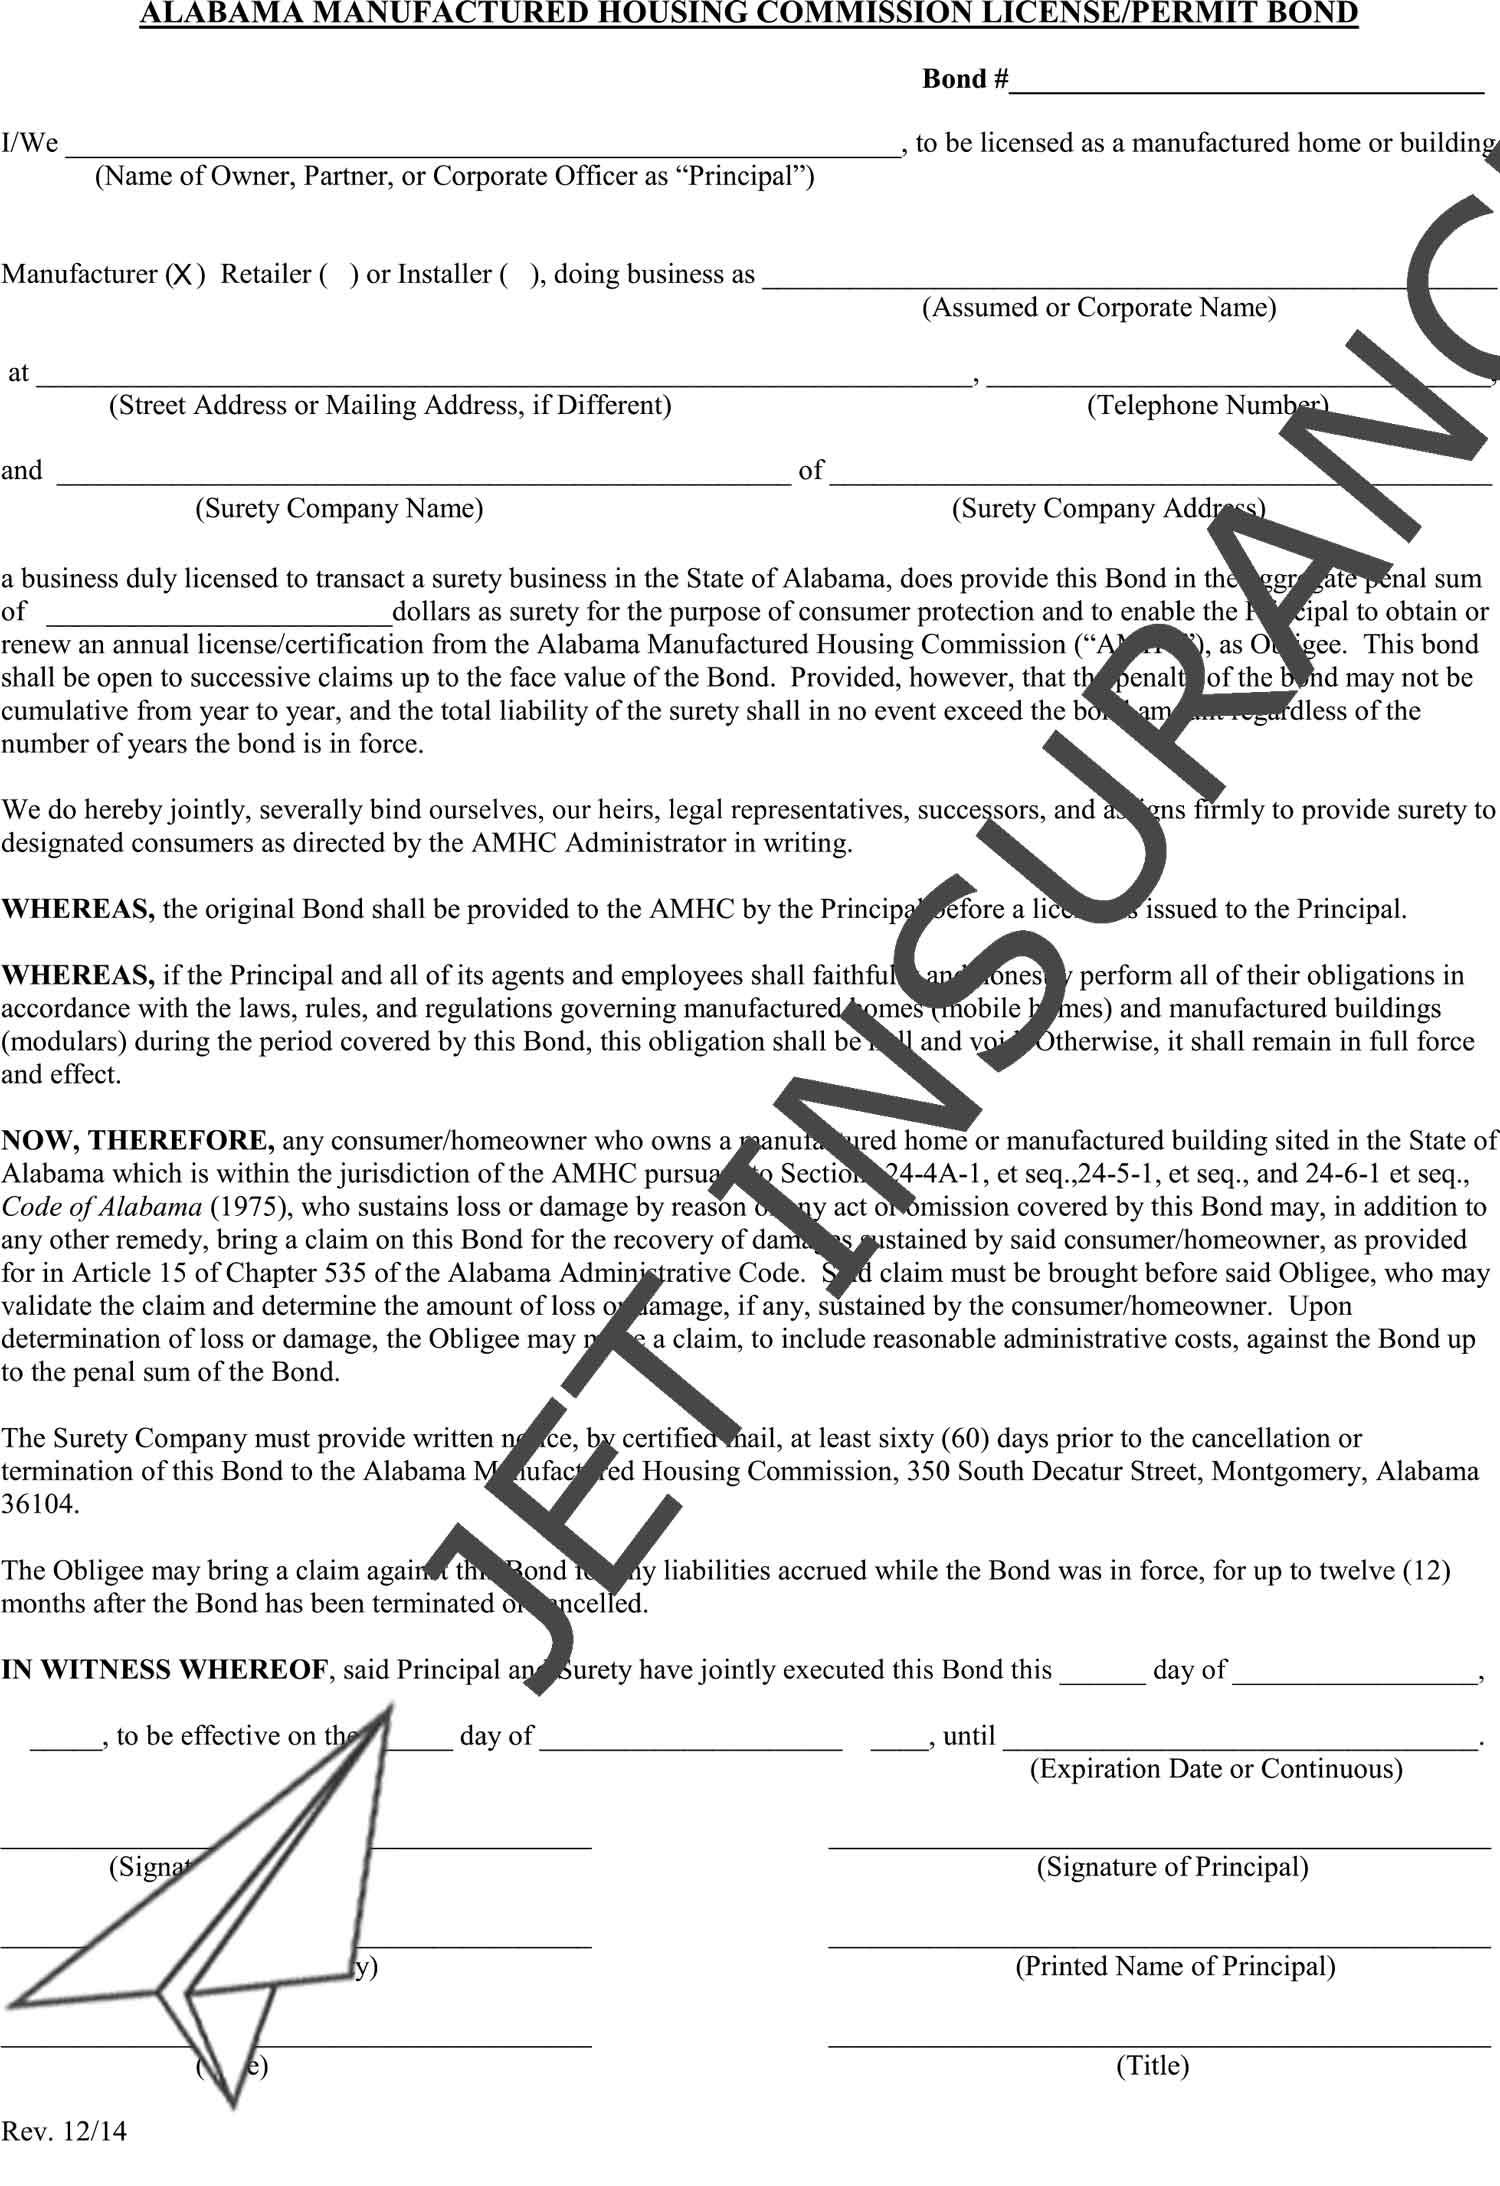 Alabama Manufactured Housing Bond Form